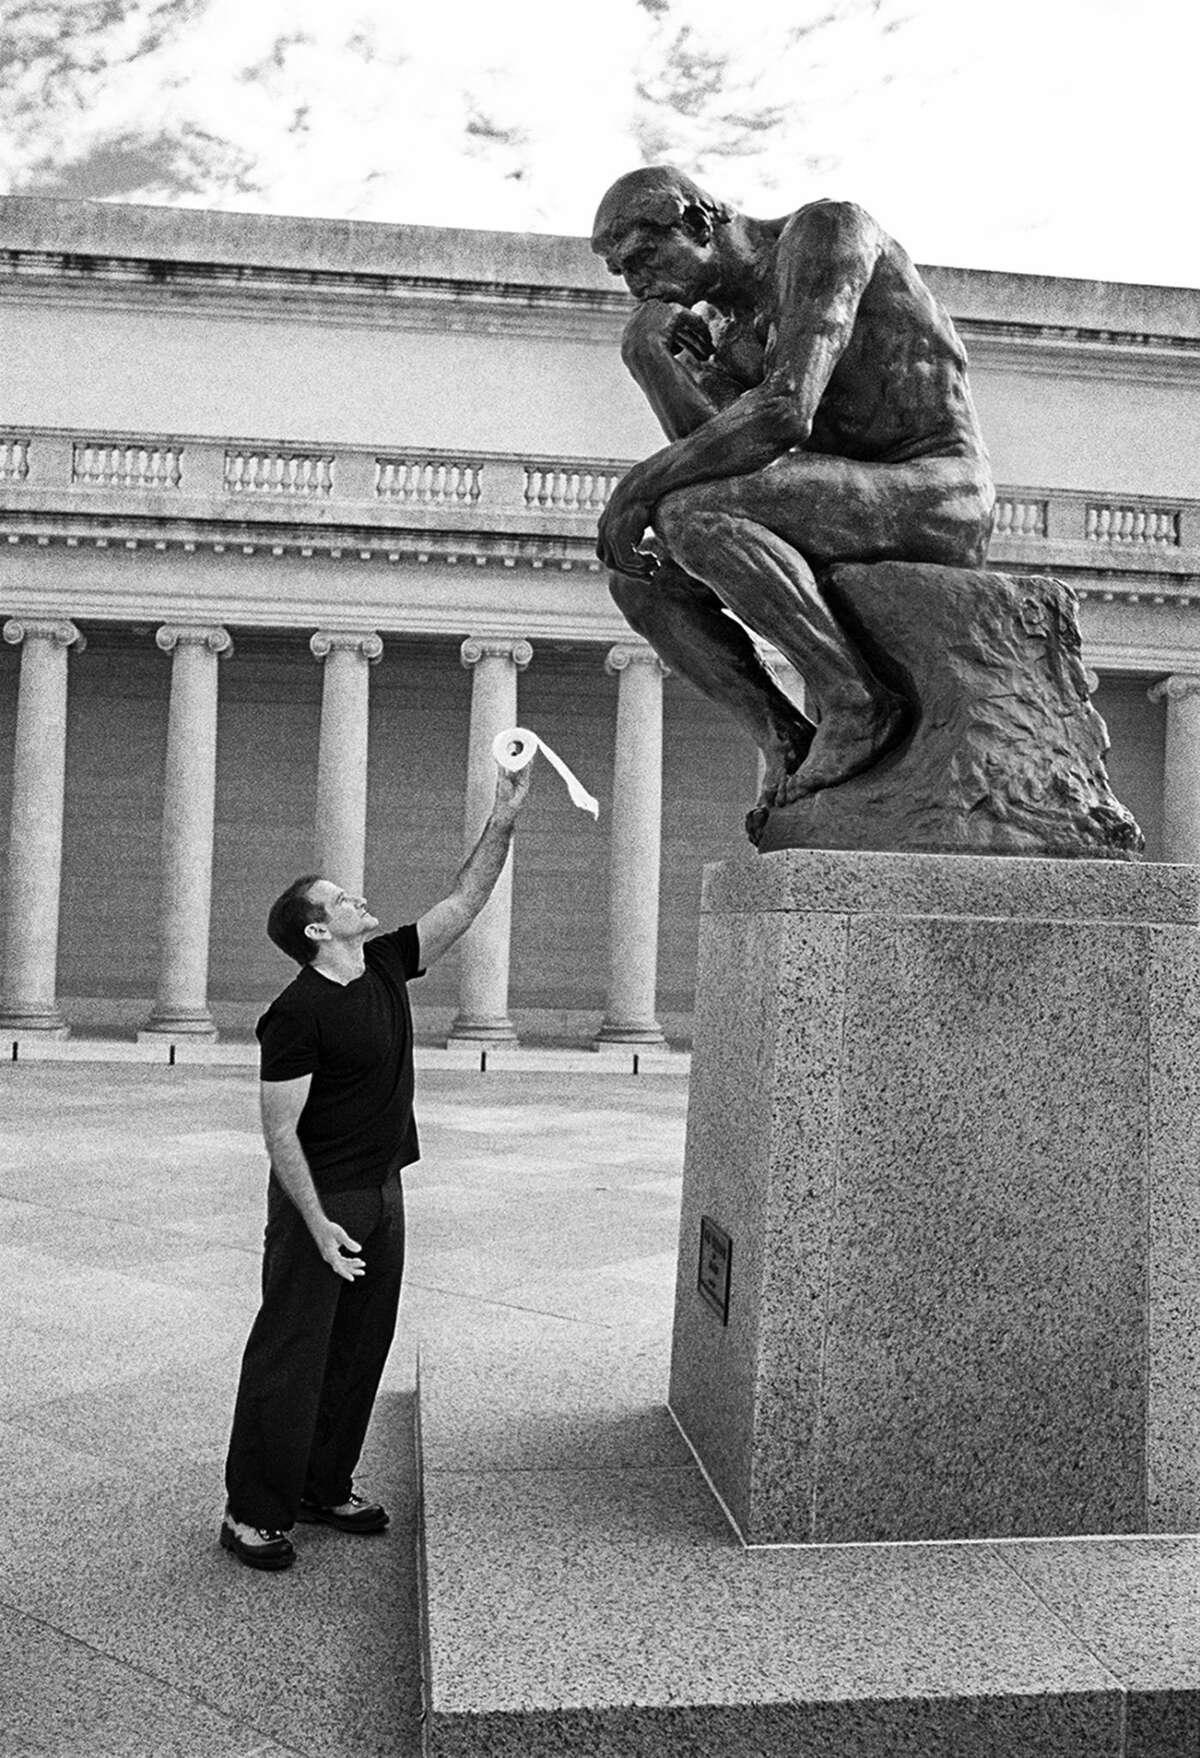 Description: Arthur Grace Untitled (Robin Williams with Rodin's Thinker at the Legion of Honor, San Francisco) Black and white photograph 24 x 36 in.; 61 x 91.5 cm Estimate $1,000-$2,000 © Arthur Grace